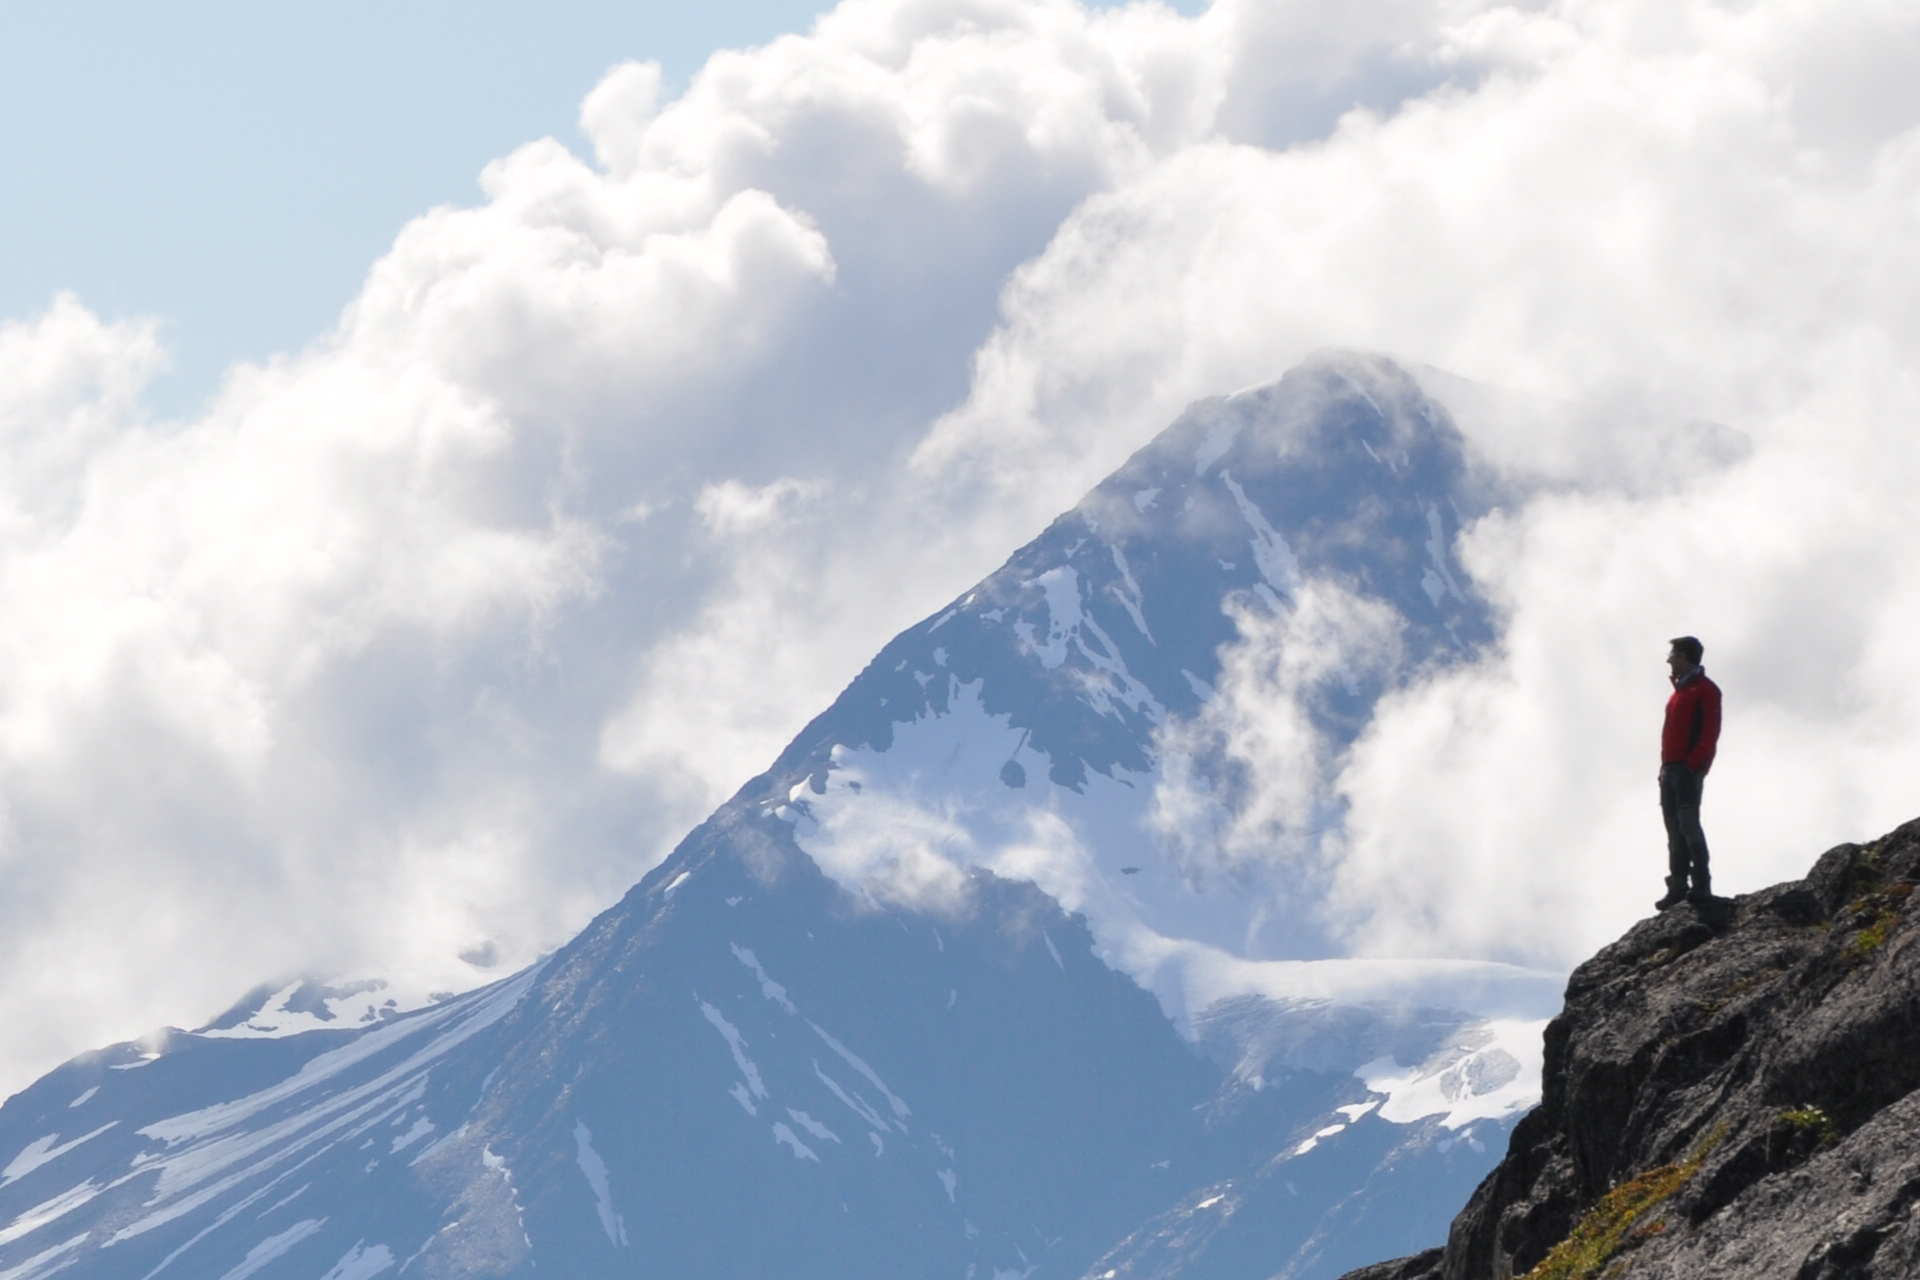 Viajes Alaska 2019: Viaje a Alaska en Canoa y Trekking 16 días